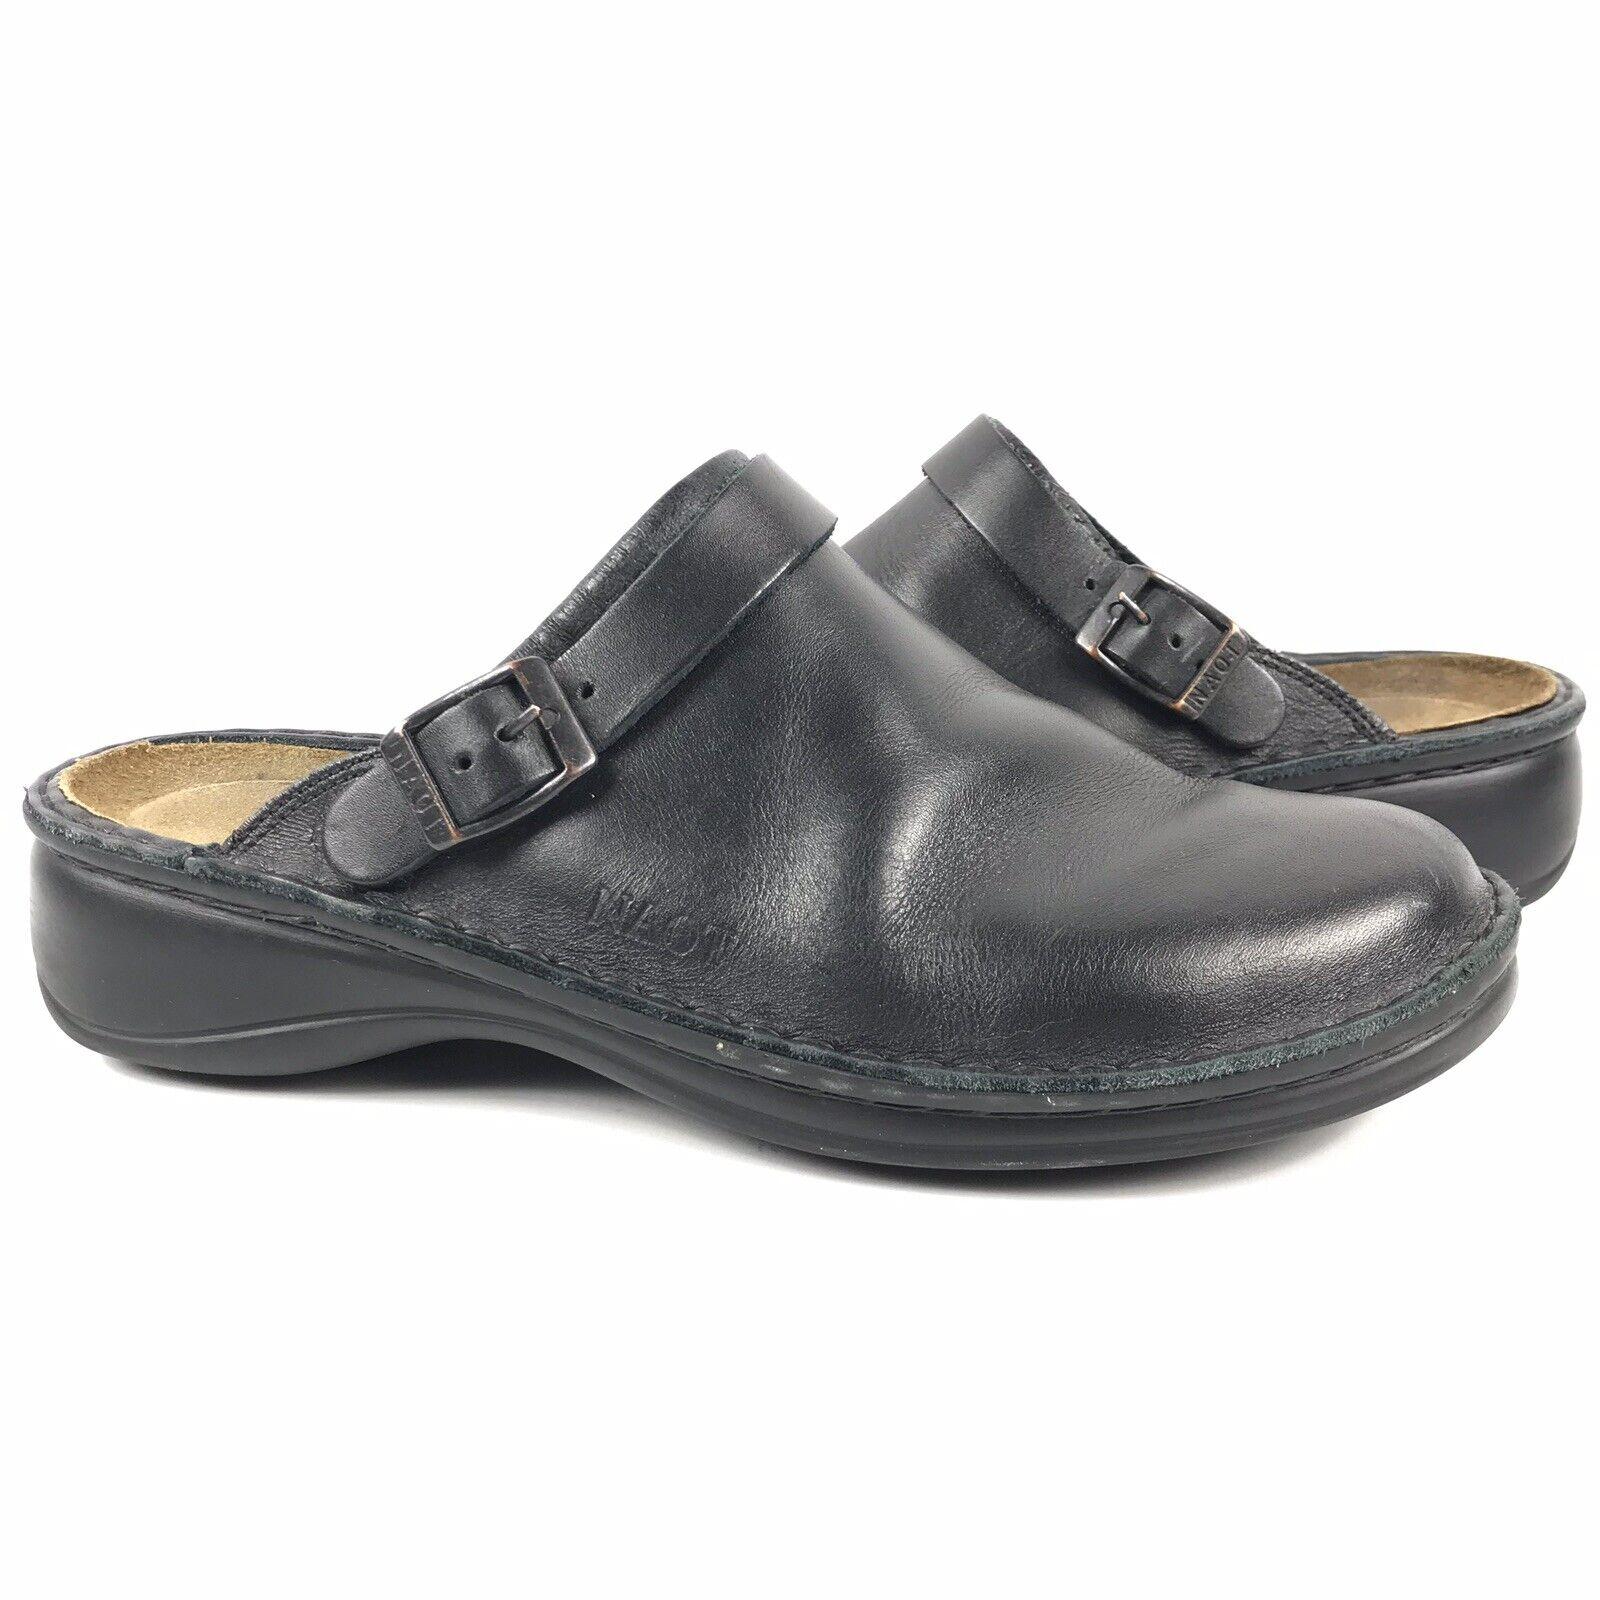 economico Naot Mule Clogs donna Dimensione 40 nero Leather Leather Leather Slip On Adjustable Buckle scarpe  compra meglio